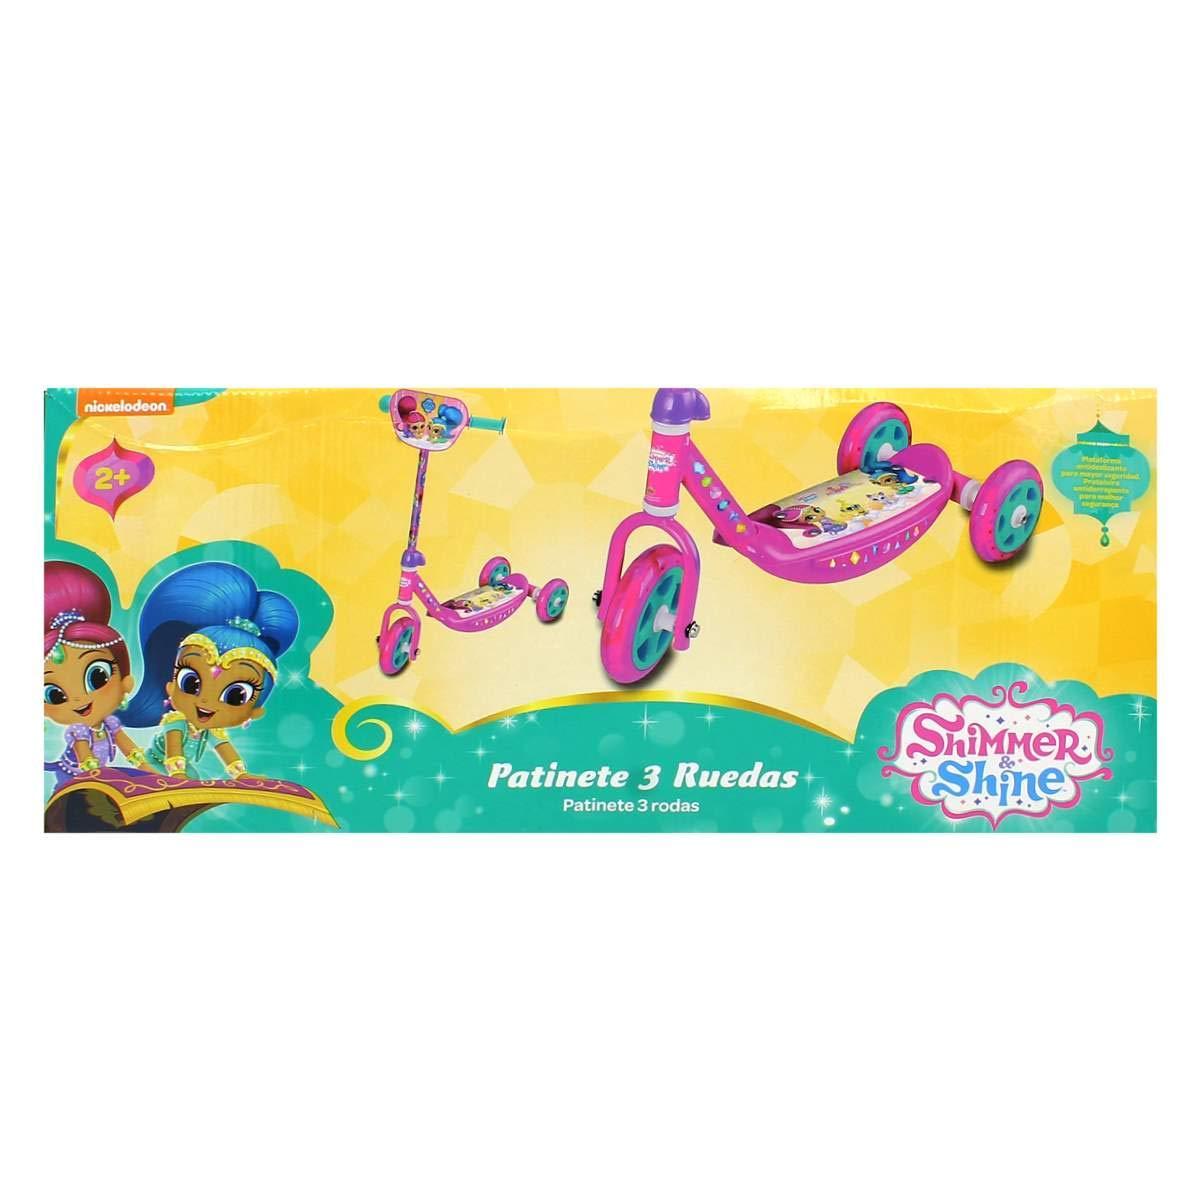 Muñecas Saica Shimmer & Shine Patinete 3 Ruedas: Amazon.es ...